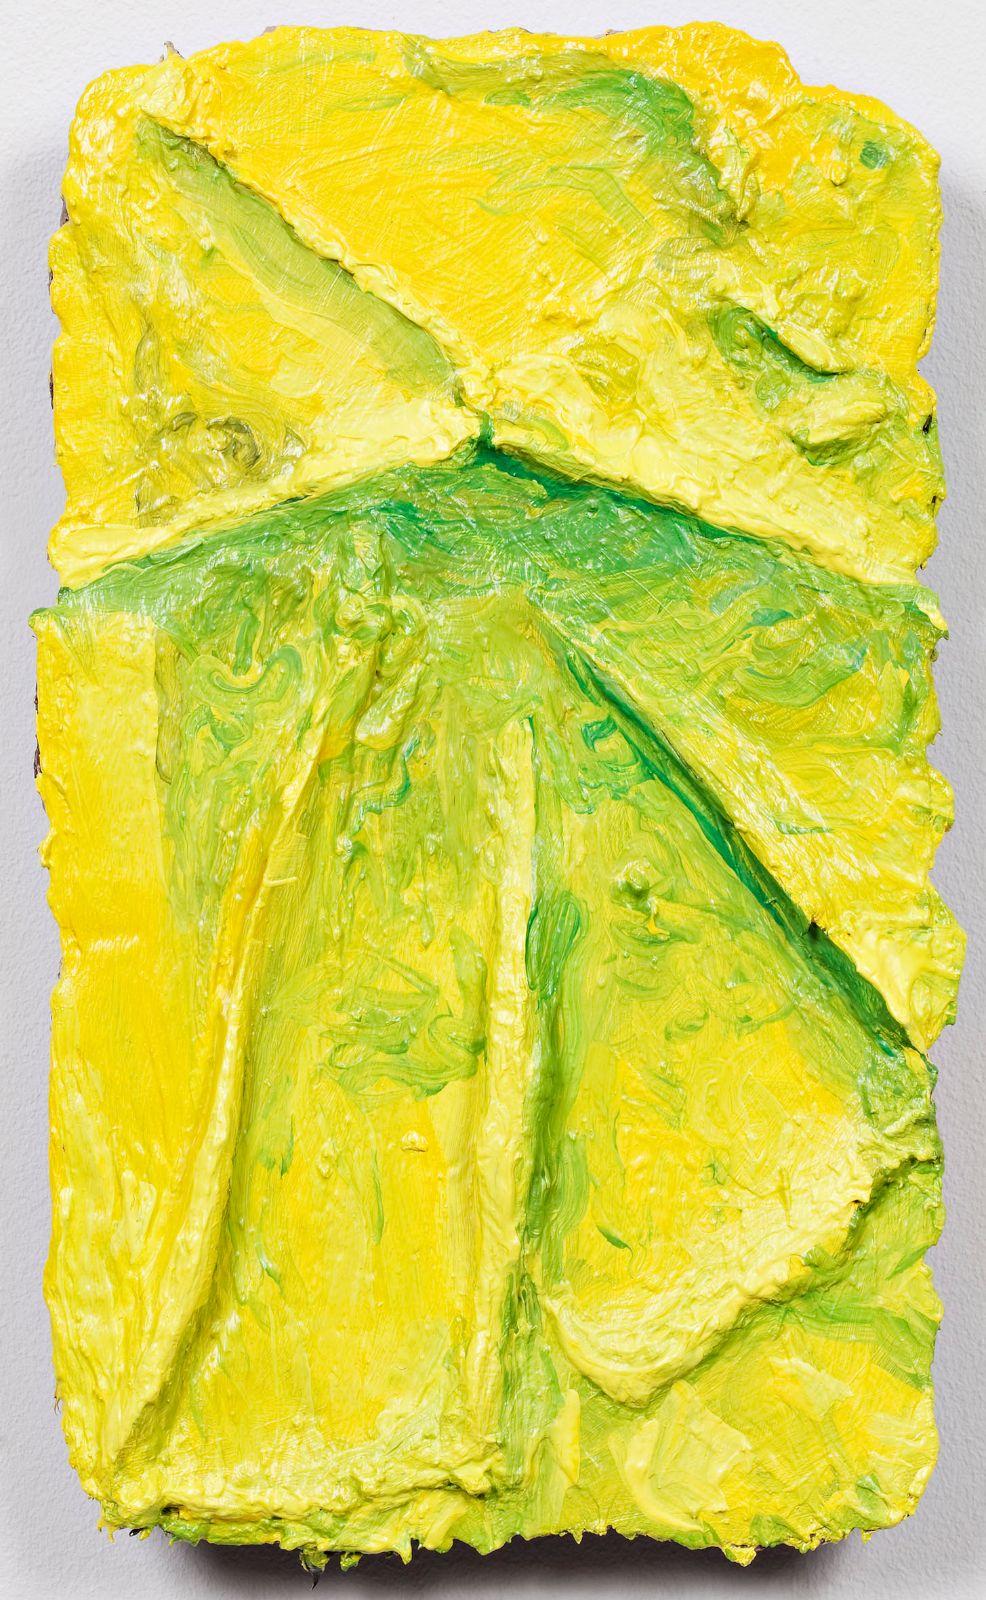 Studie til et ideelt hode (Hyder), 2009, oil on canvas on panel, 32.5 x 19.5 cm